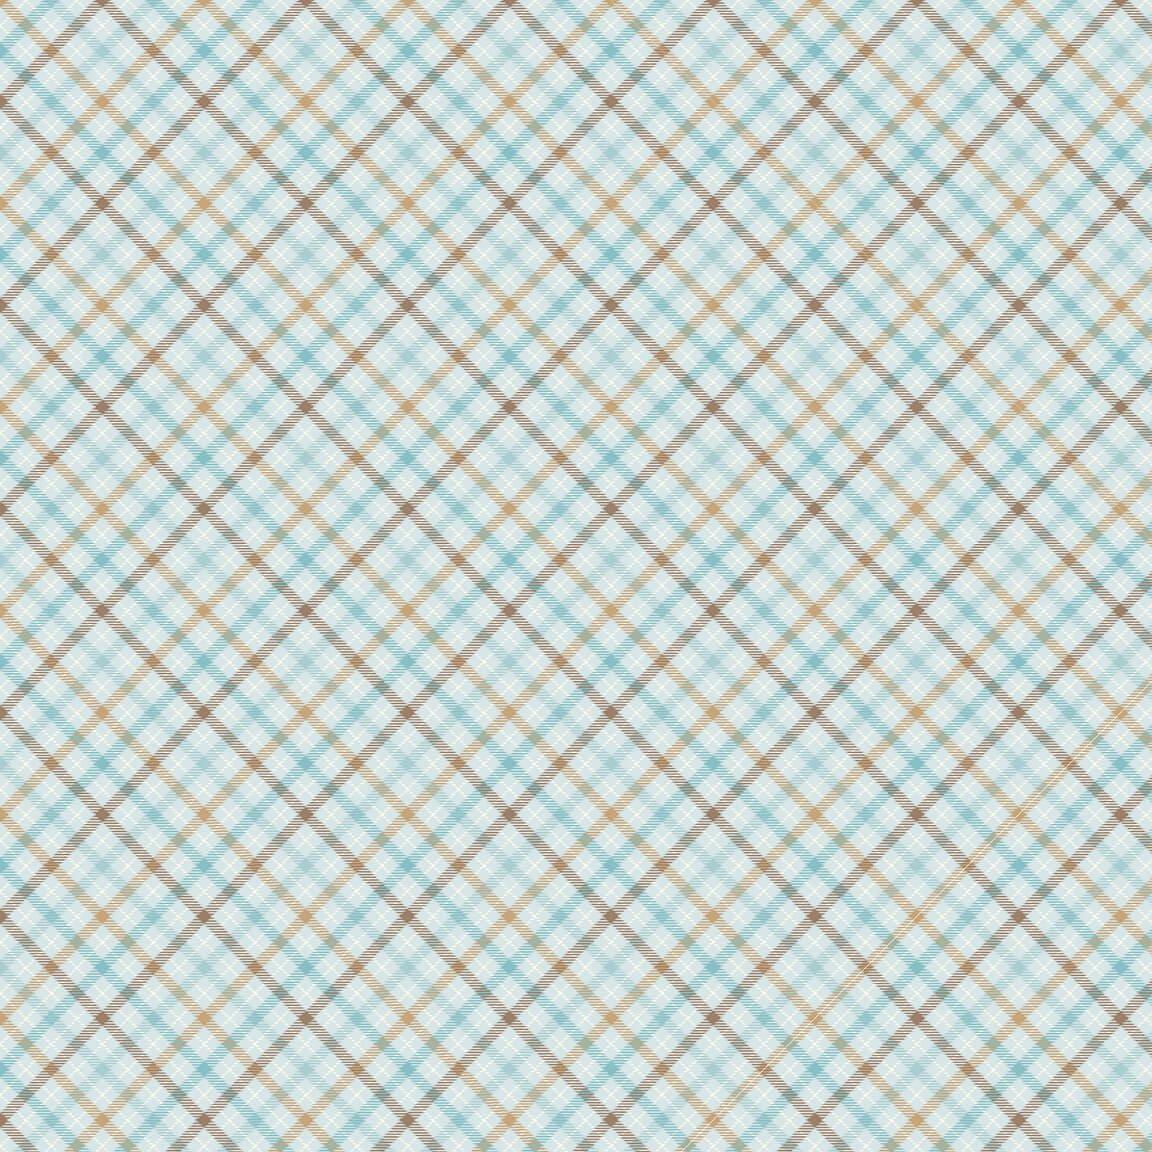 Henry Glass - Flannel I Love Sn'Gnomies  - Multi Plaid